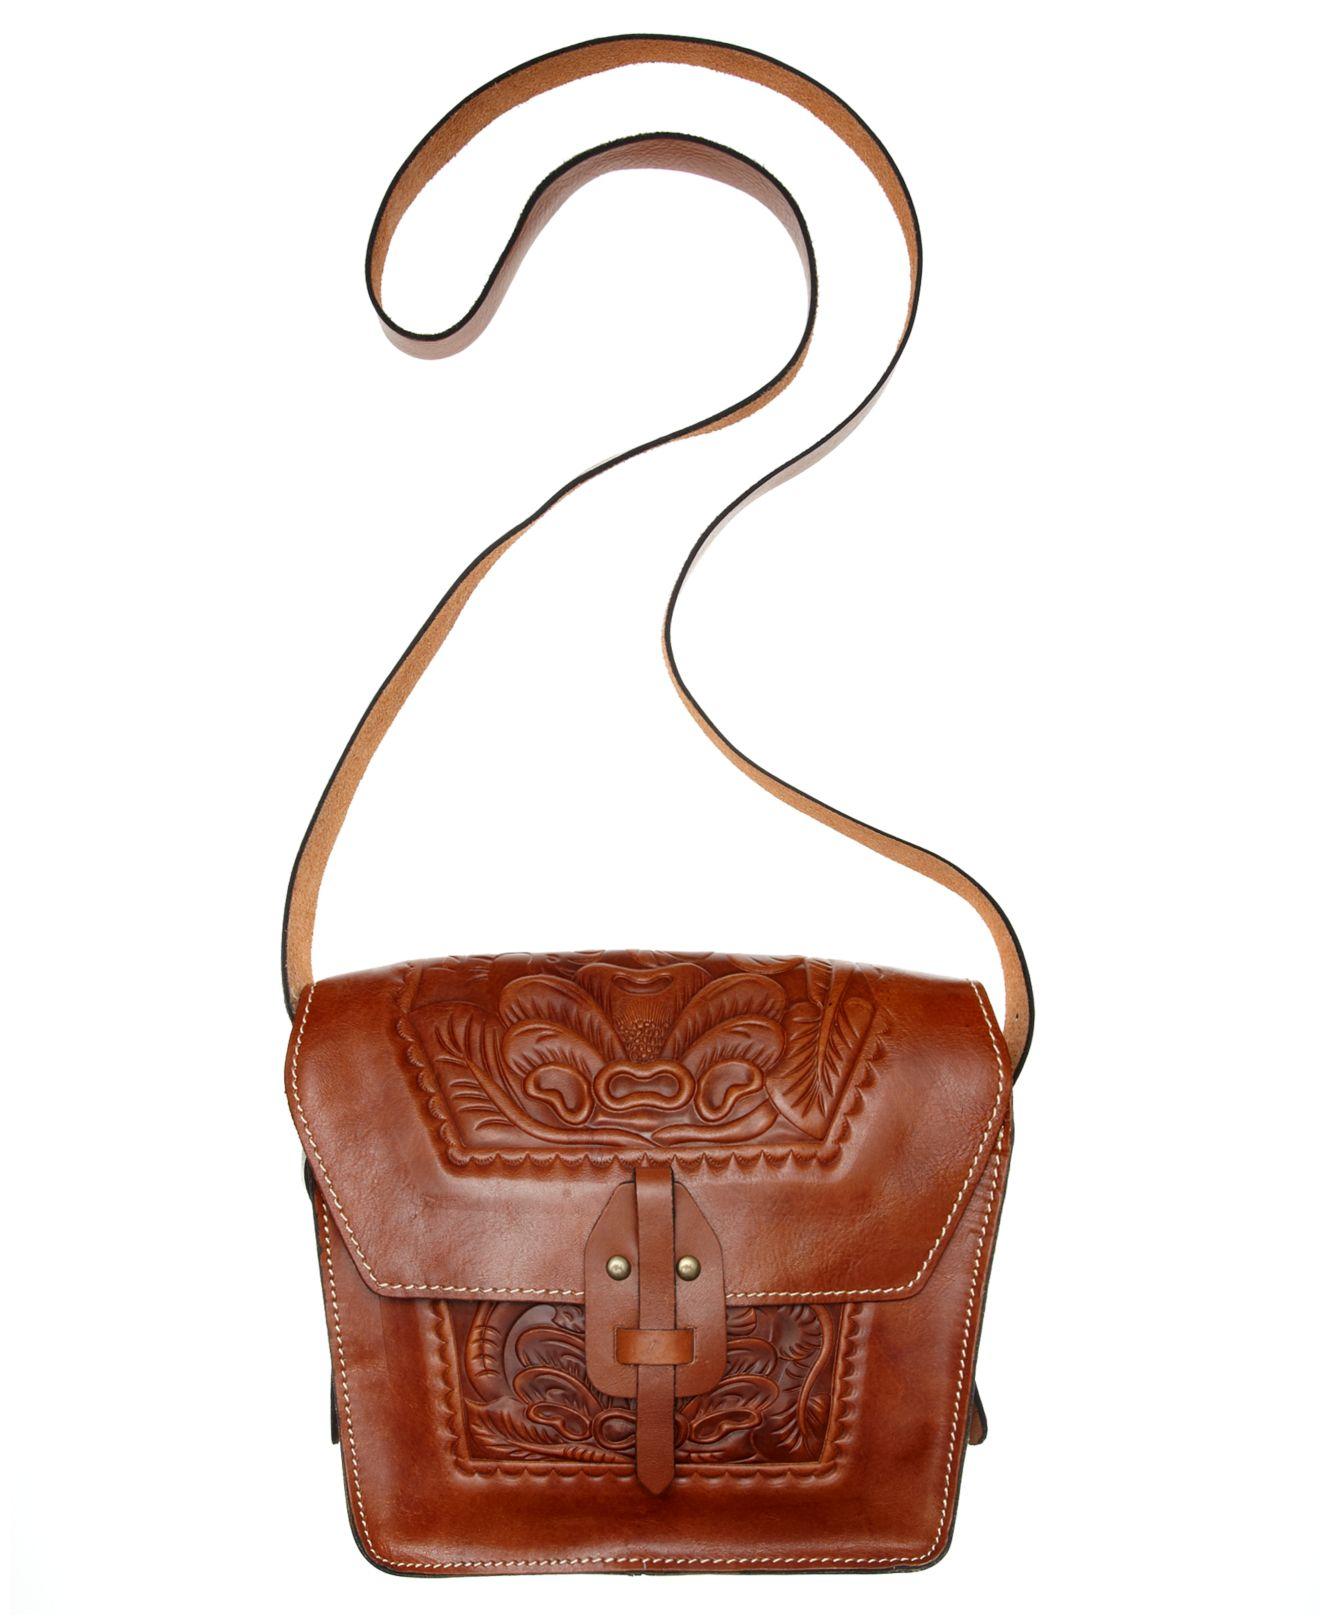 Furla Outlet Discount THE SAK Lucia Crossbody Bag Cocoa women Medium Handbags,% authentic,Hot Sale [SALE-US ] - SALE-US THE SAK women Medium Handbags, THE SAK Lucia Crossbody Bag Cocoa women Medium Handbags,% authentic,Hot Sale .